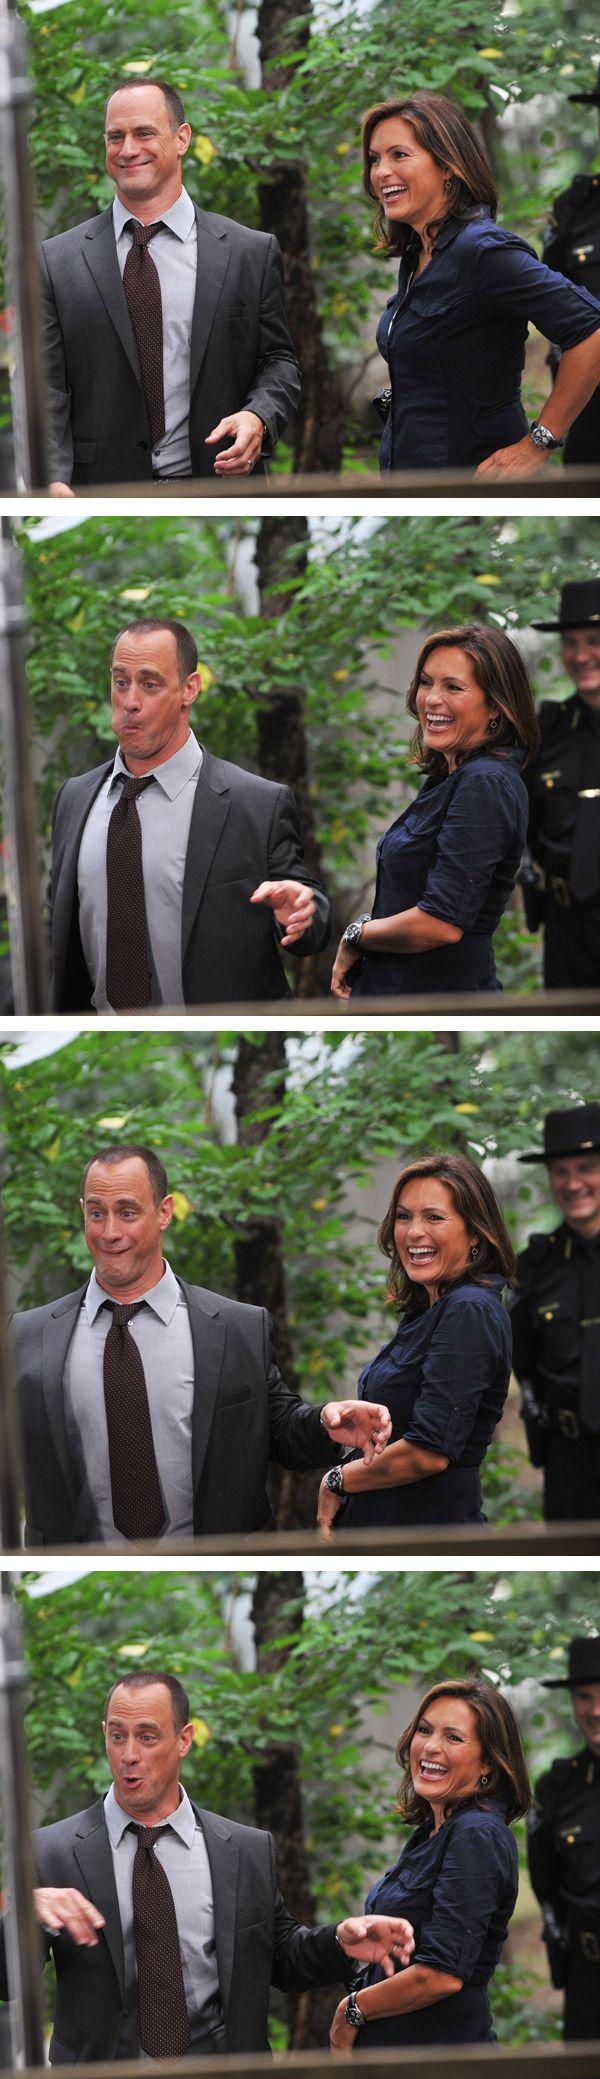 CHRISTOPHER MELONI & MARISKA HARGITAY (Goofing around on the set of Law & Order: SVU)